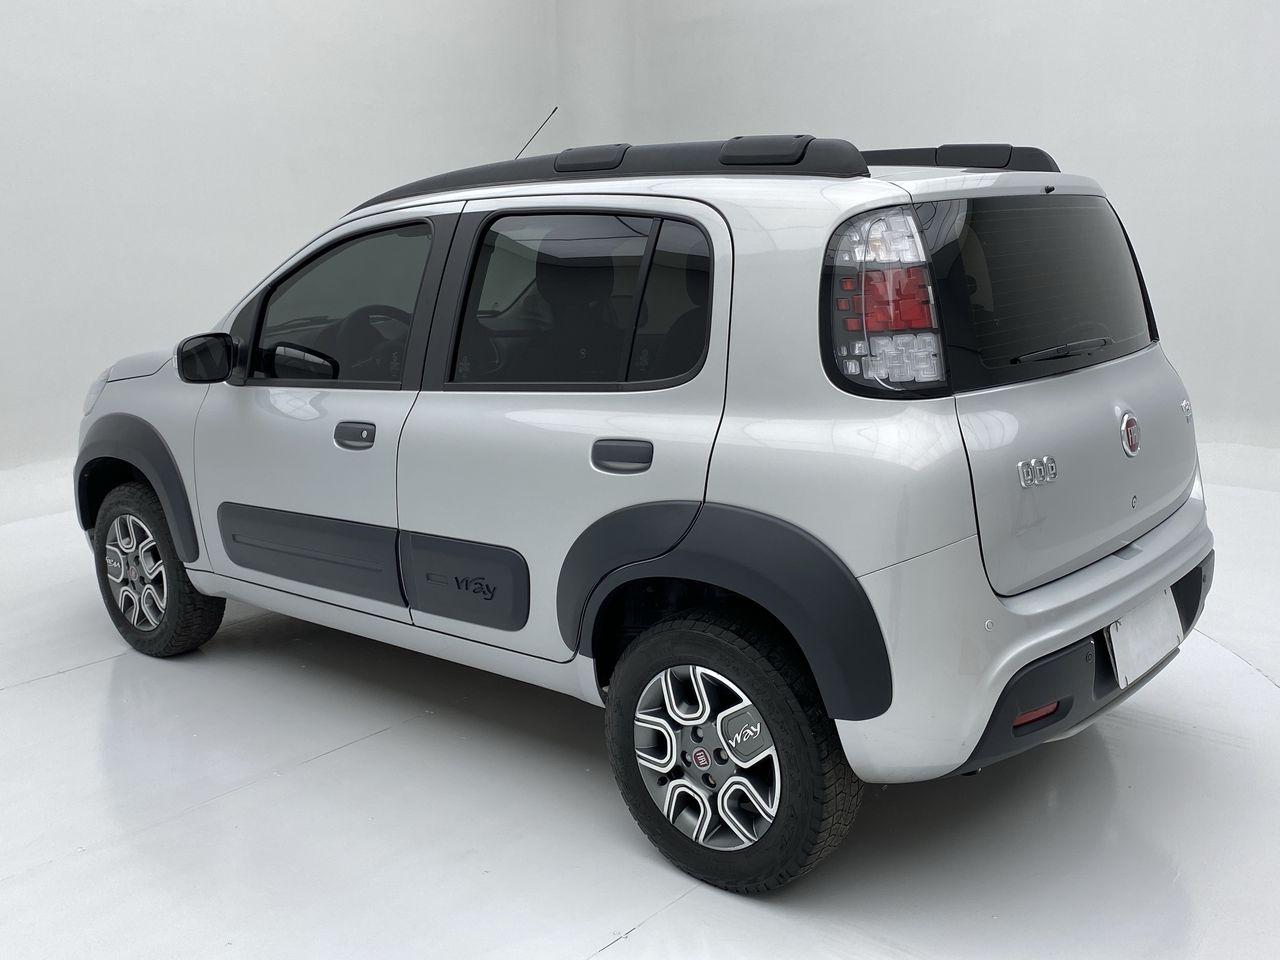 Fiat UNO WAY 1.4 EVO Dualogic Flex 8V 5p